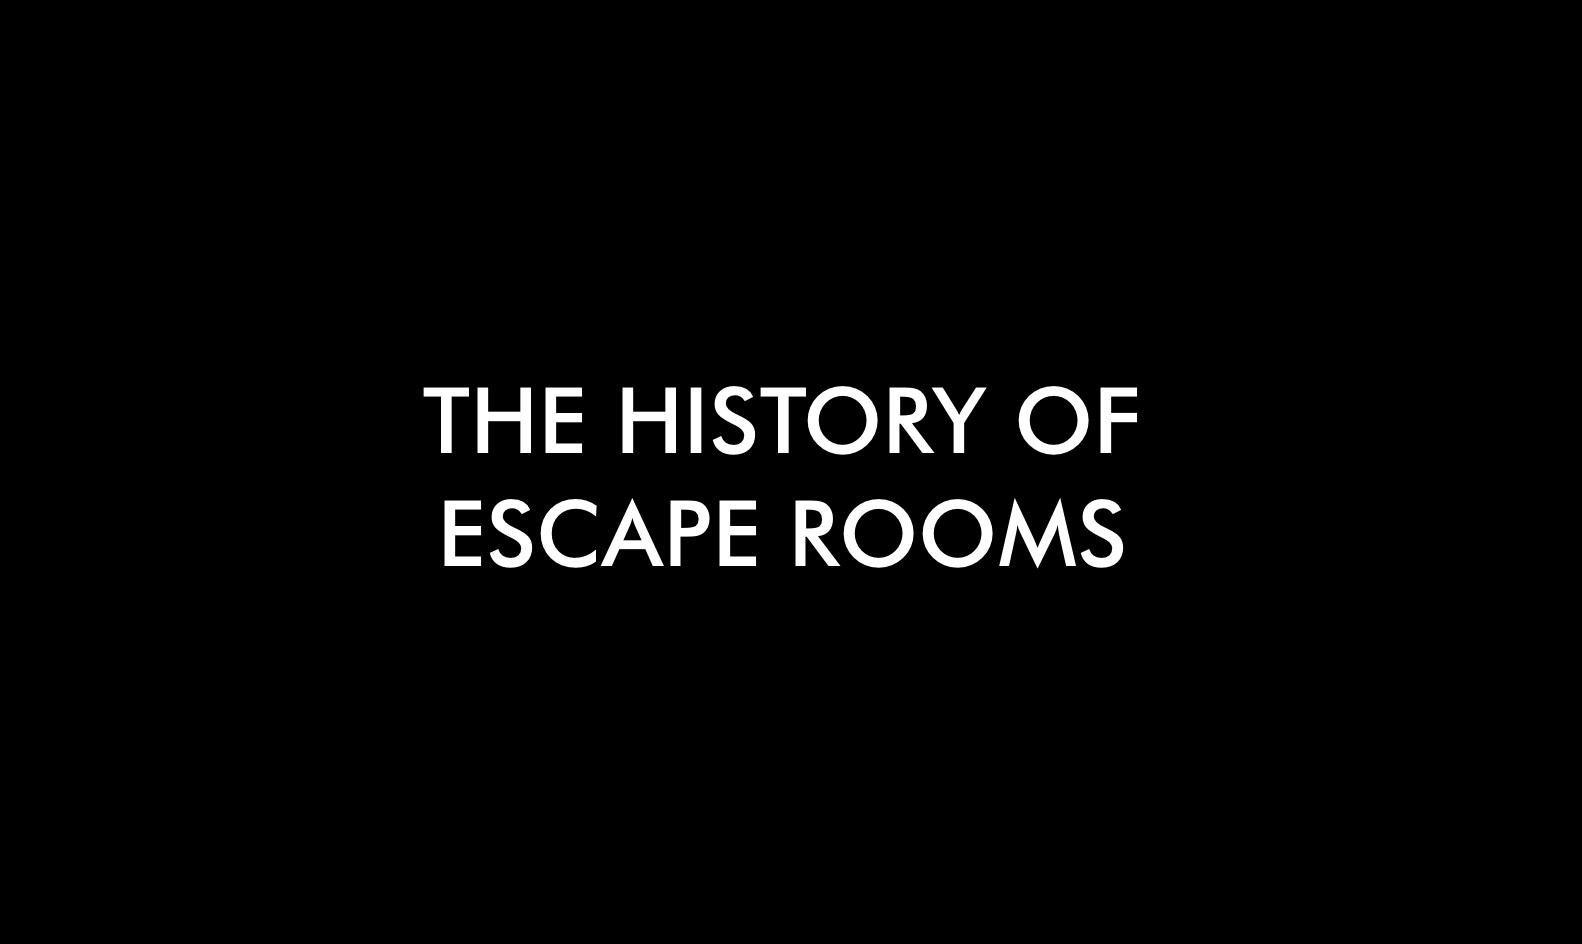 The History of Escape Rooms   Escape Room London